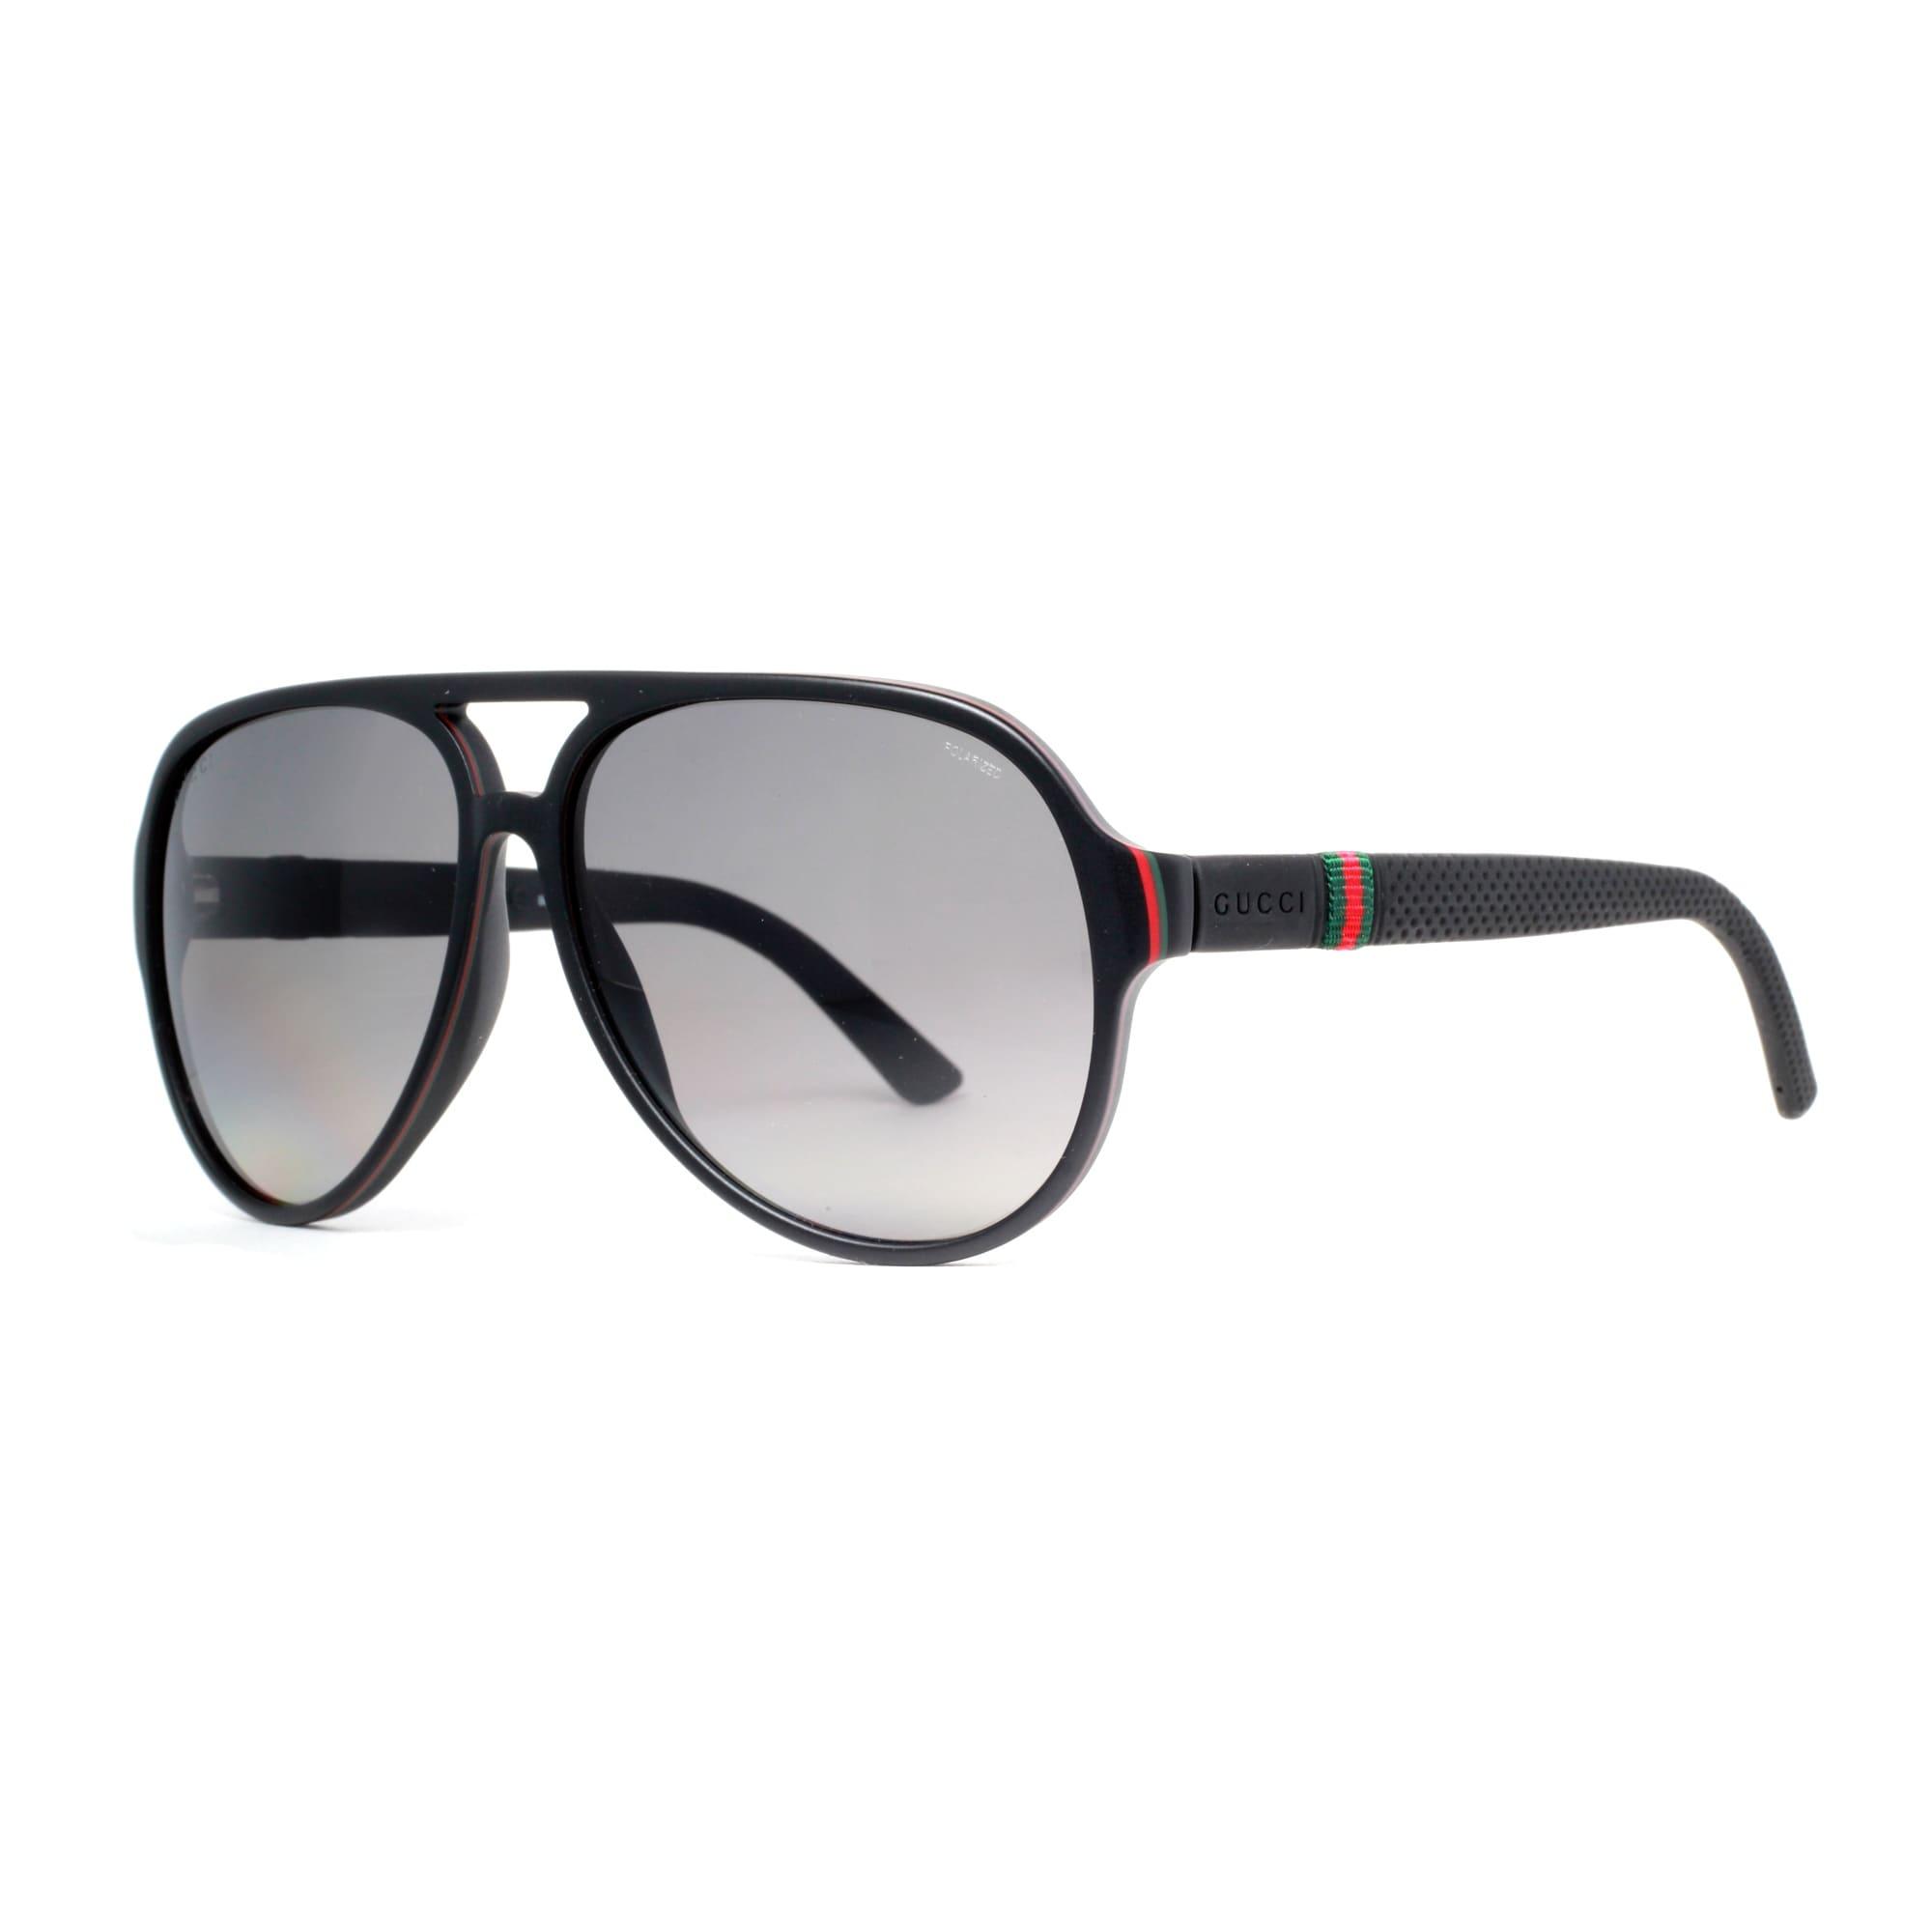 6b95458571 GUCCI Aviator GG 1065 S Unisex 4UP WJ Matte Black Gray Sunglasses -  59mm-13mm-140mm